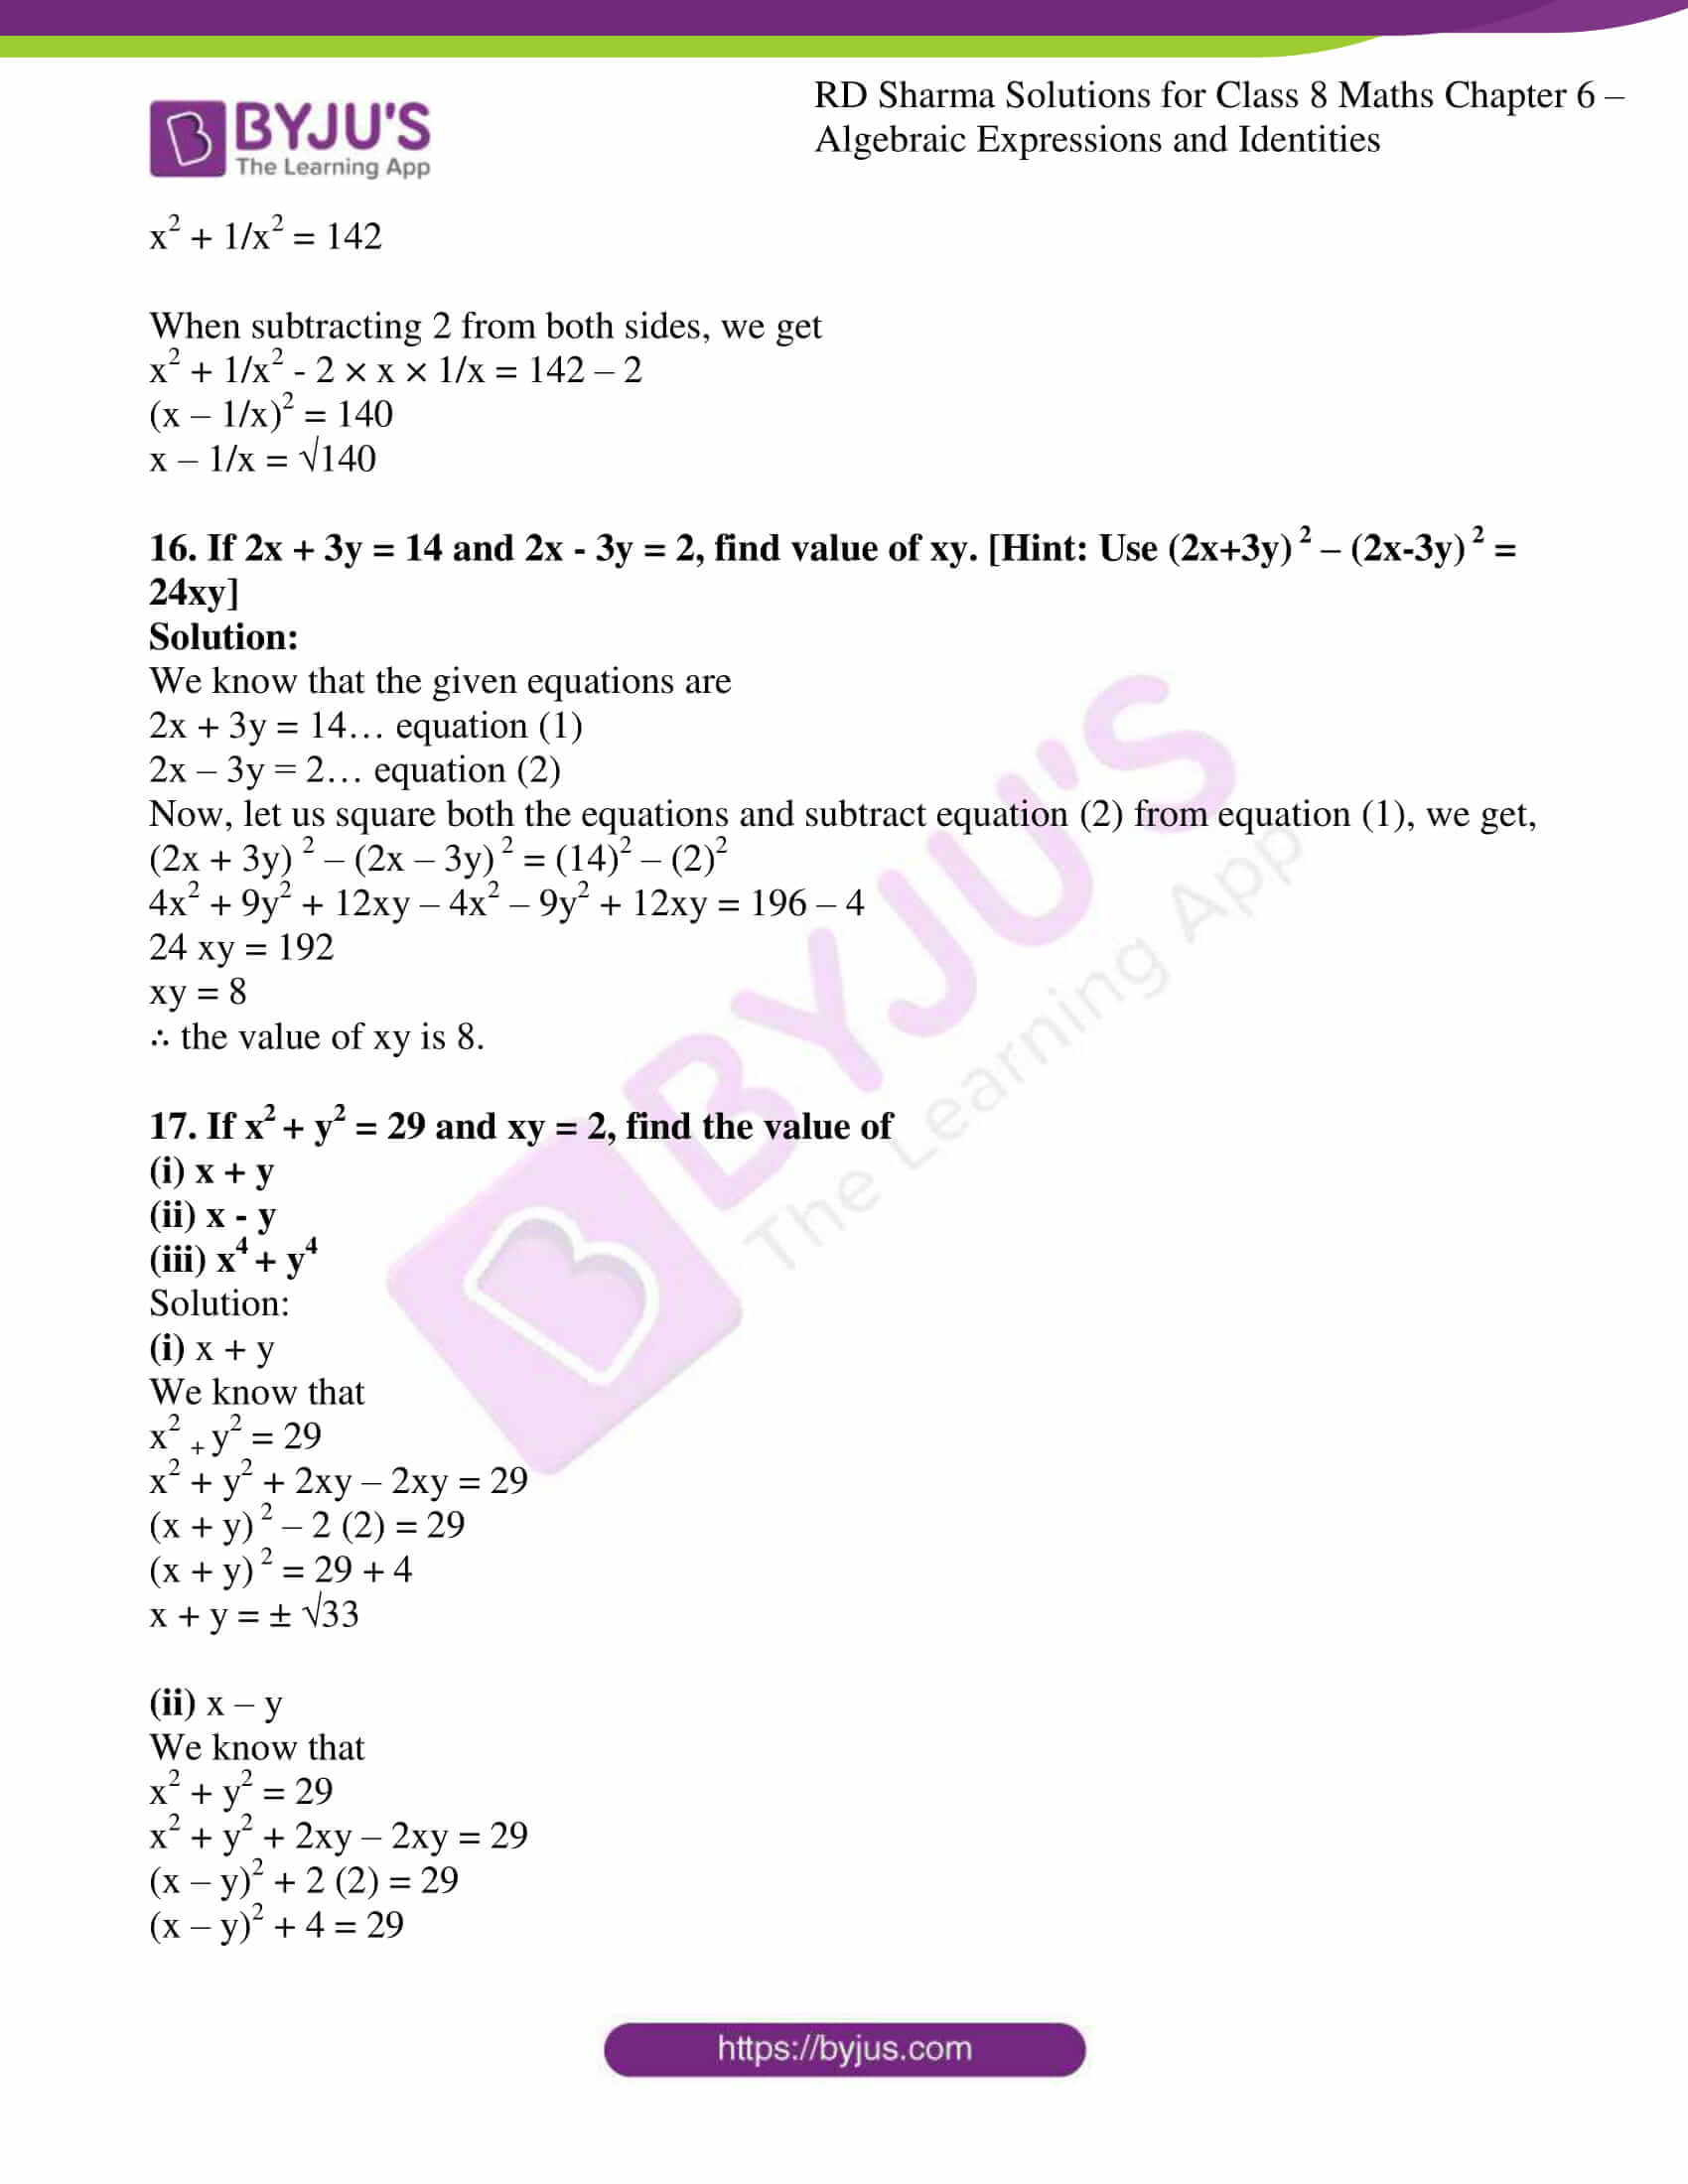 rd sharma class 8 maths chapter 6 exercise 6 13